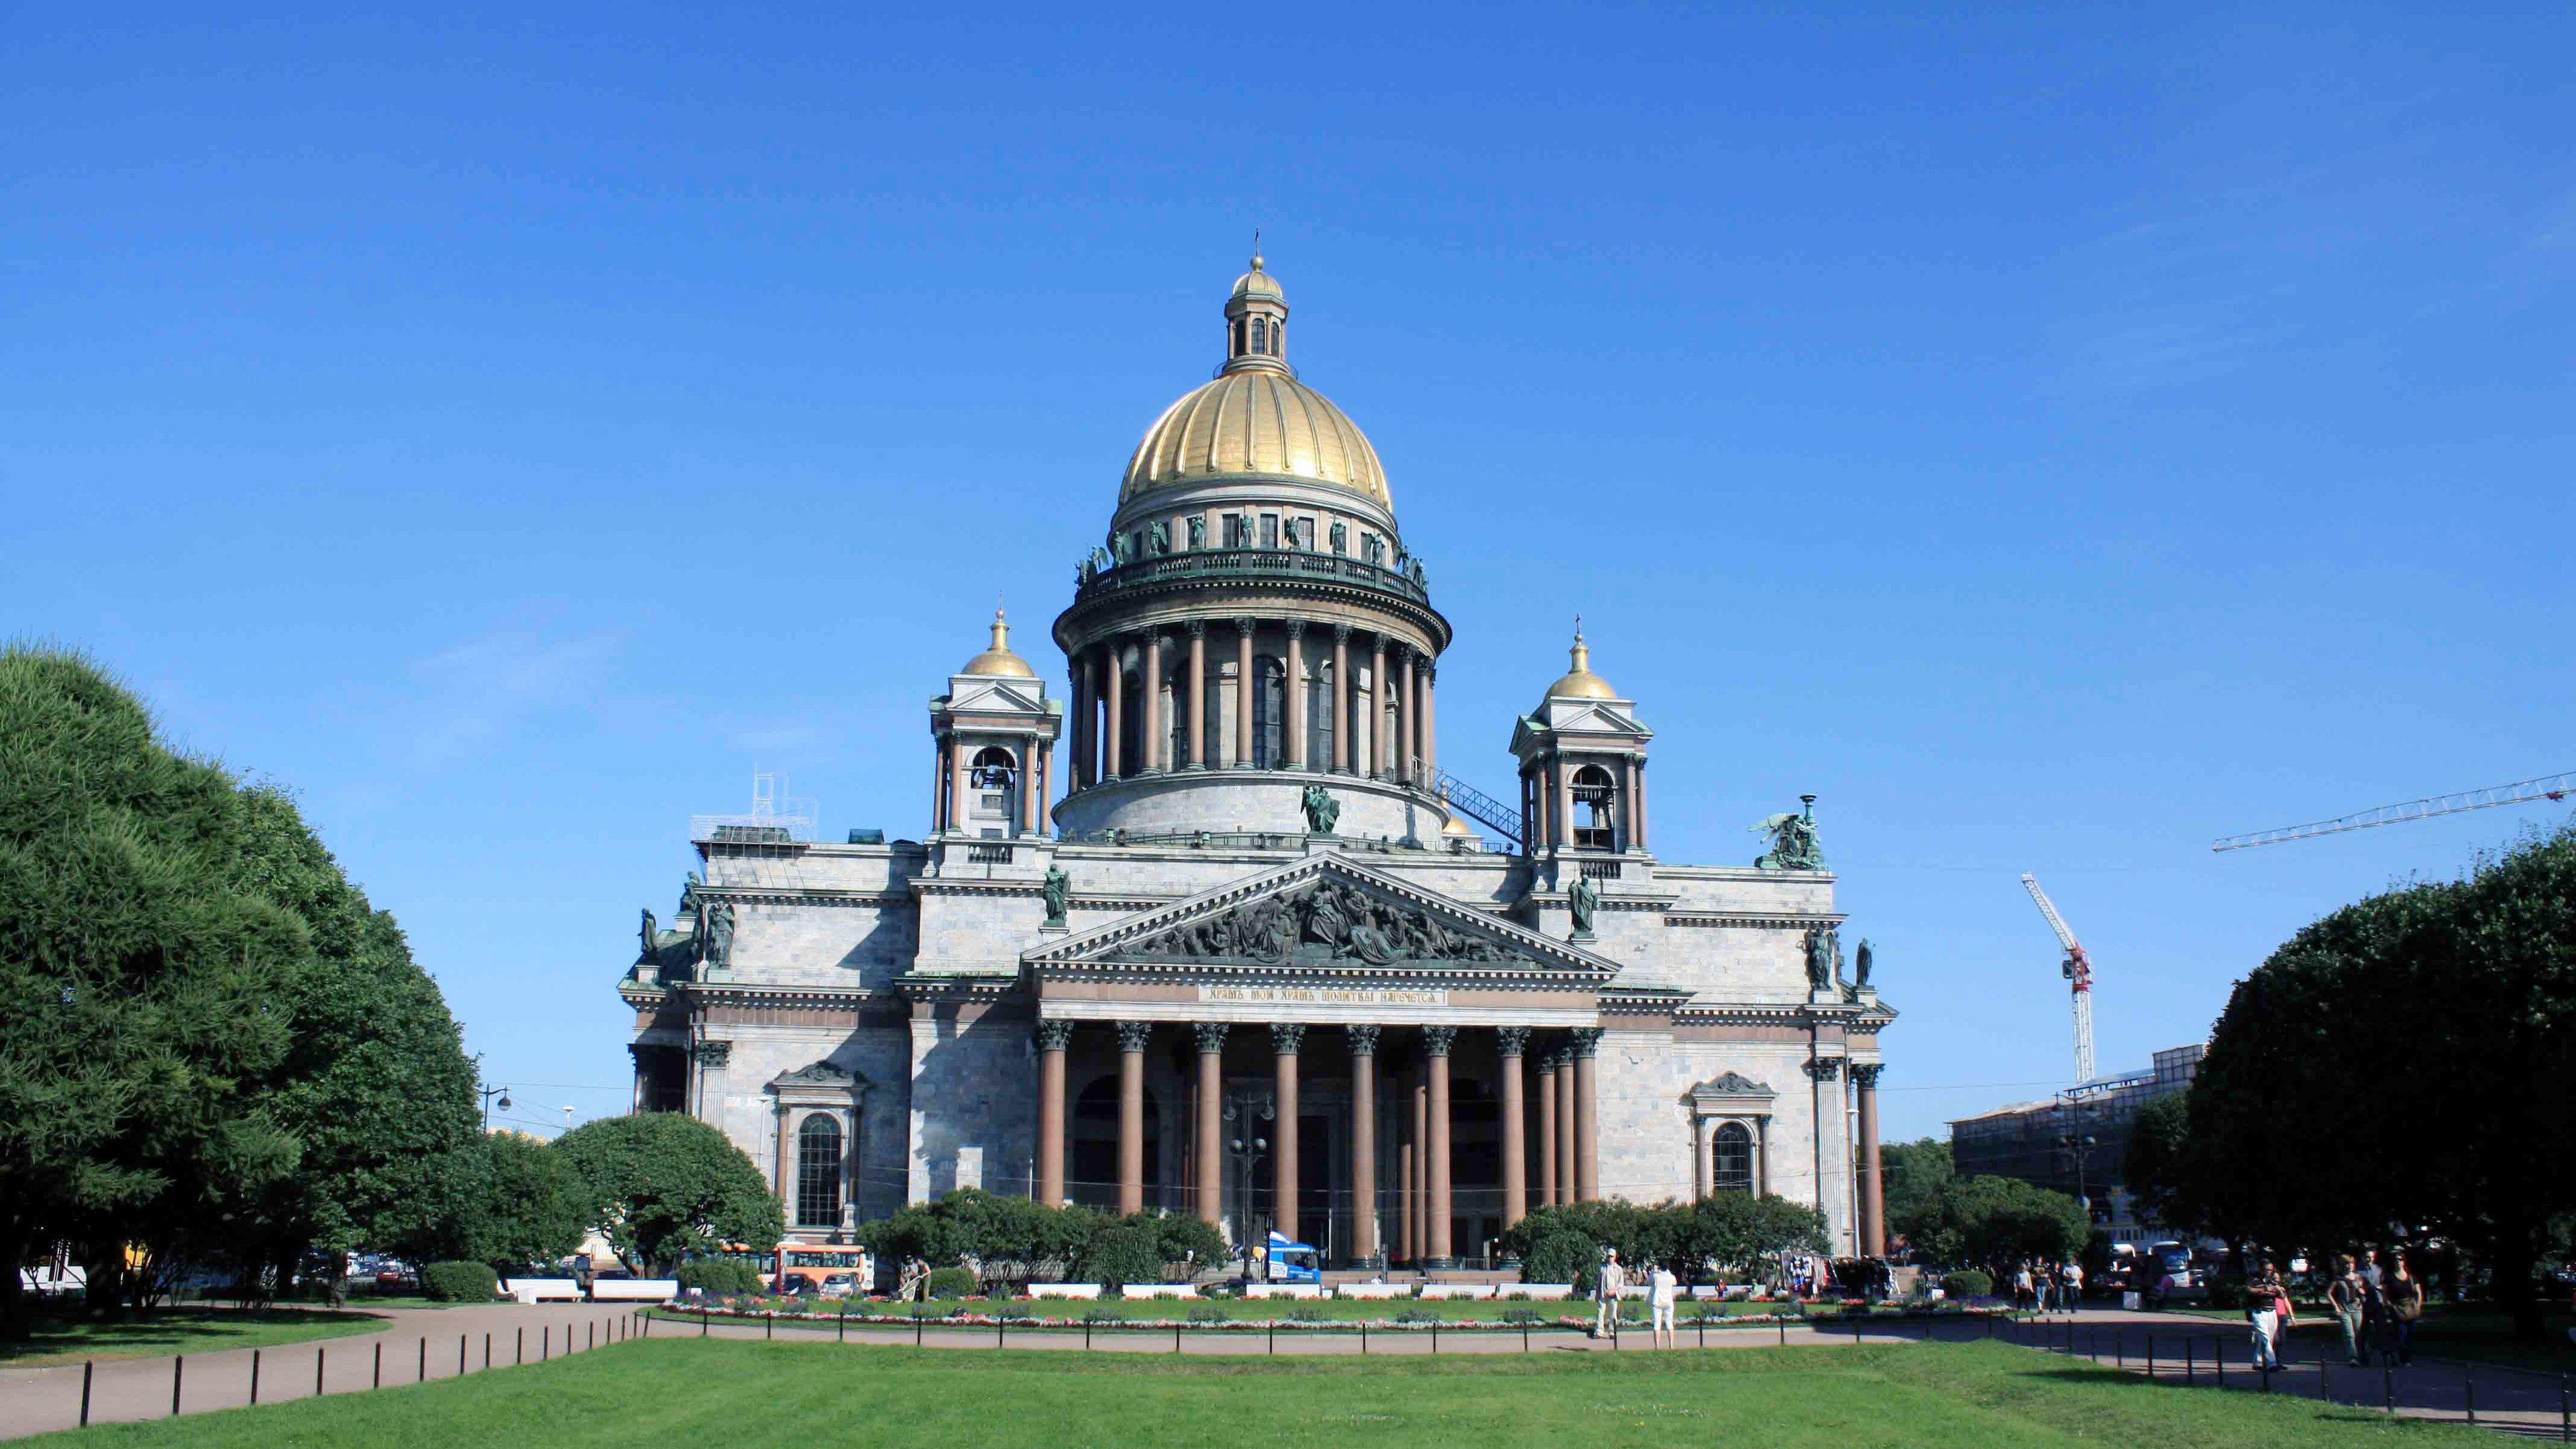 visit Saint Isaac's Cathedral in Saint Petersburg